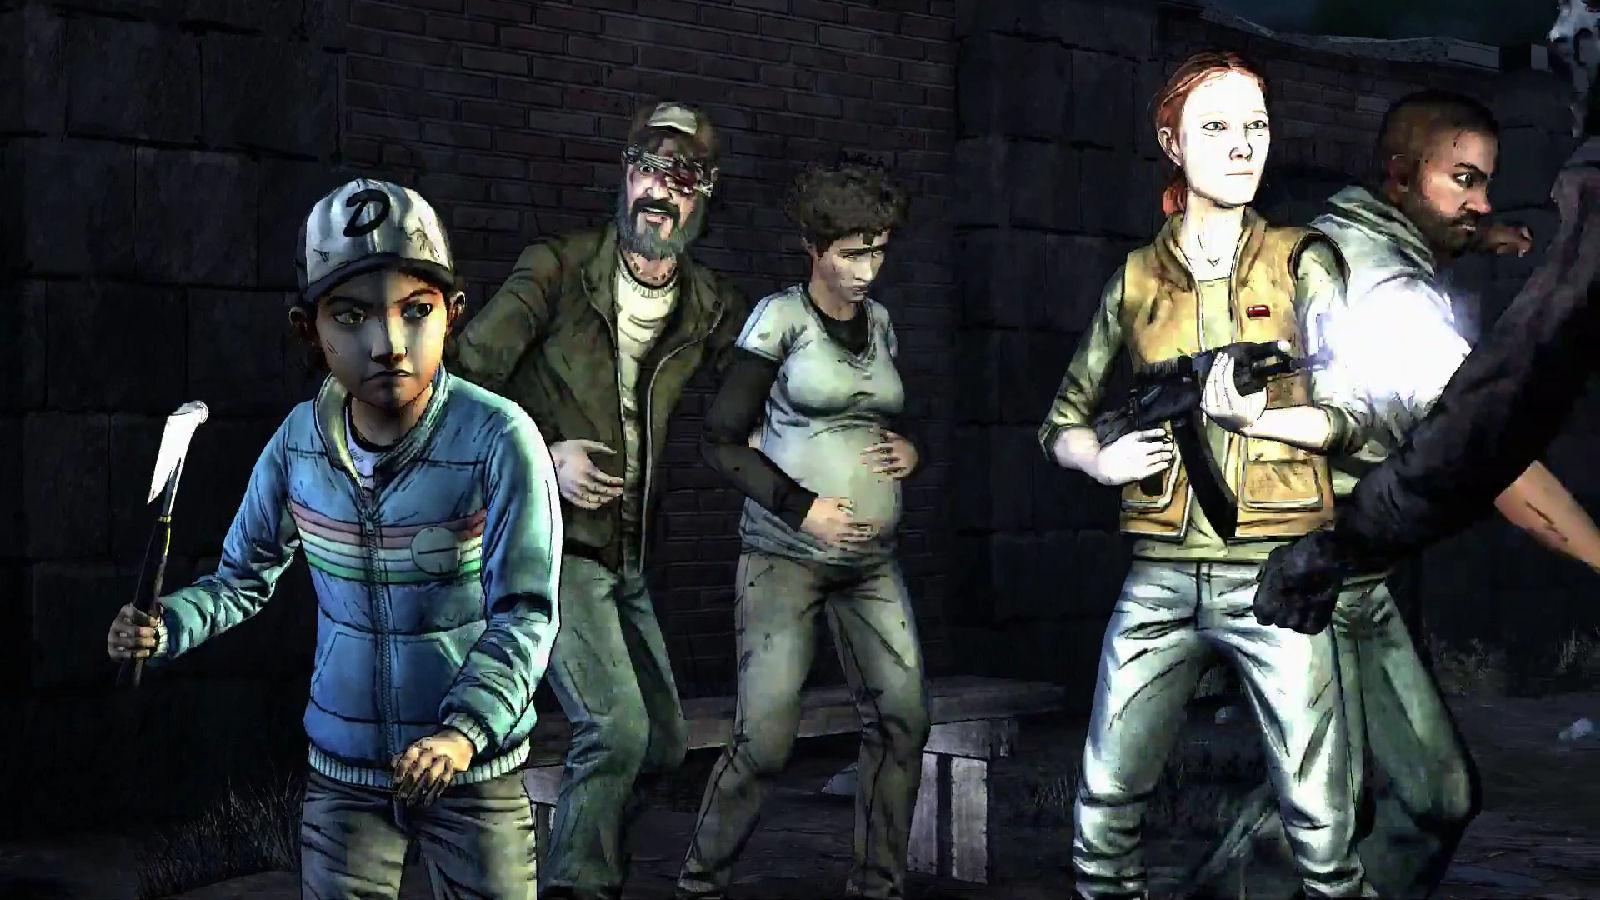 the-walking-dead-game-season-2-episode-4-zombie-hoard-attack-screenshot